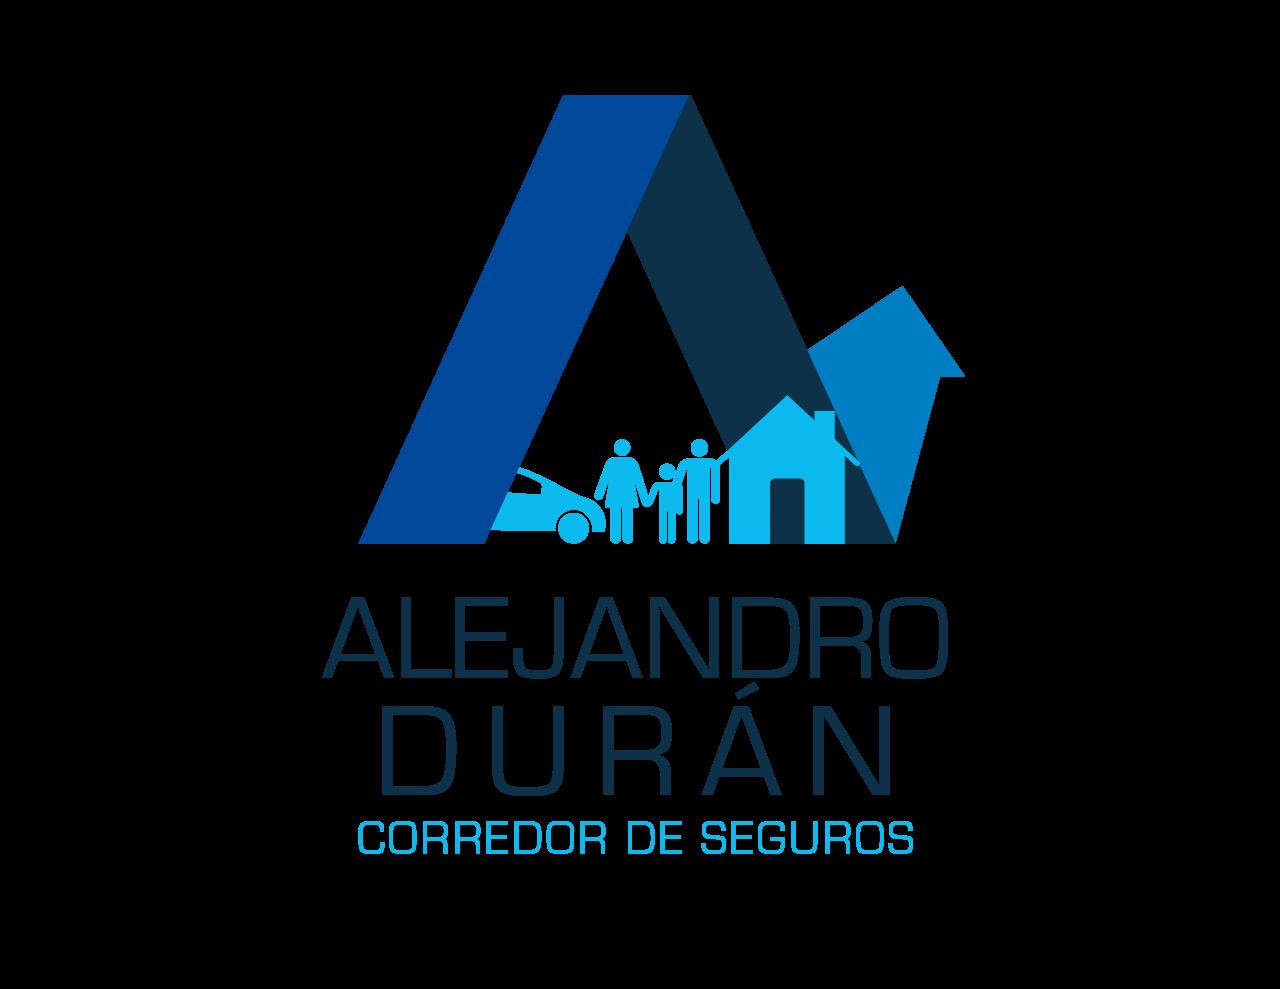 Photo of Alejandro Durán, Corredor de Seguros